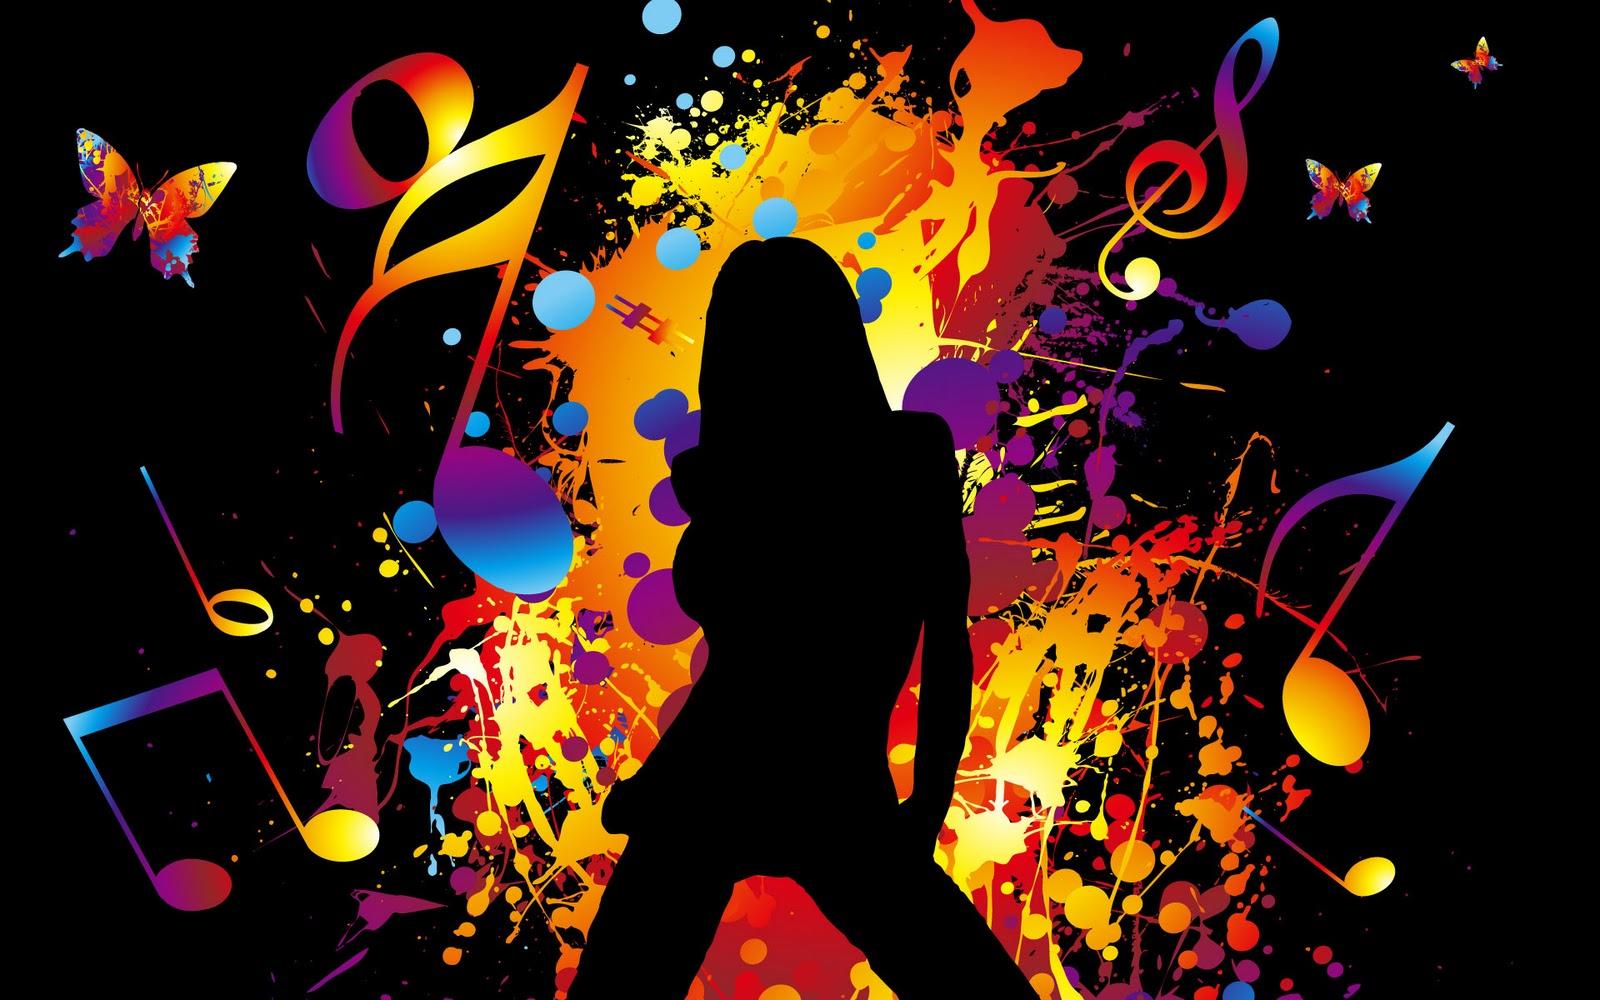 Good Wallpaper Music Party - Abstract-Women-party-wallpaper  HD_83641.jpg